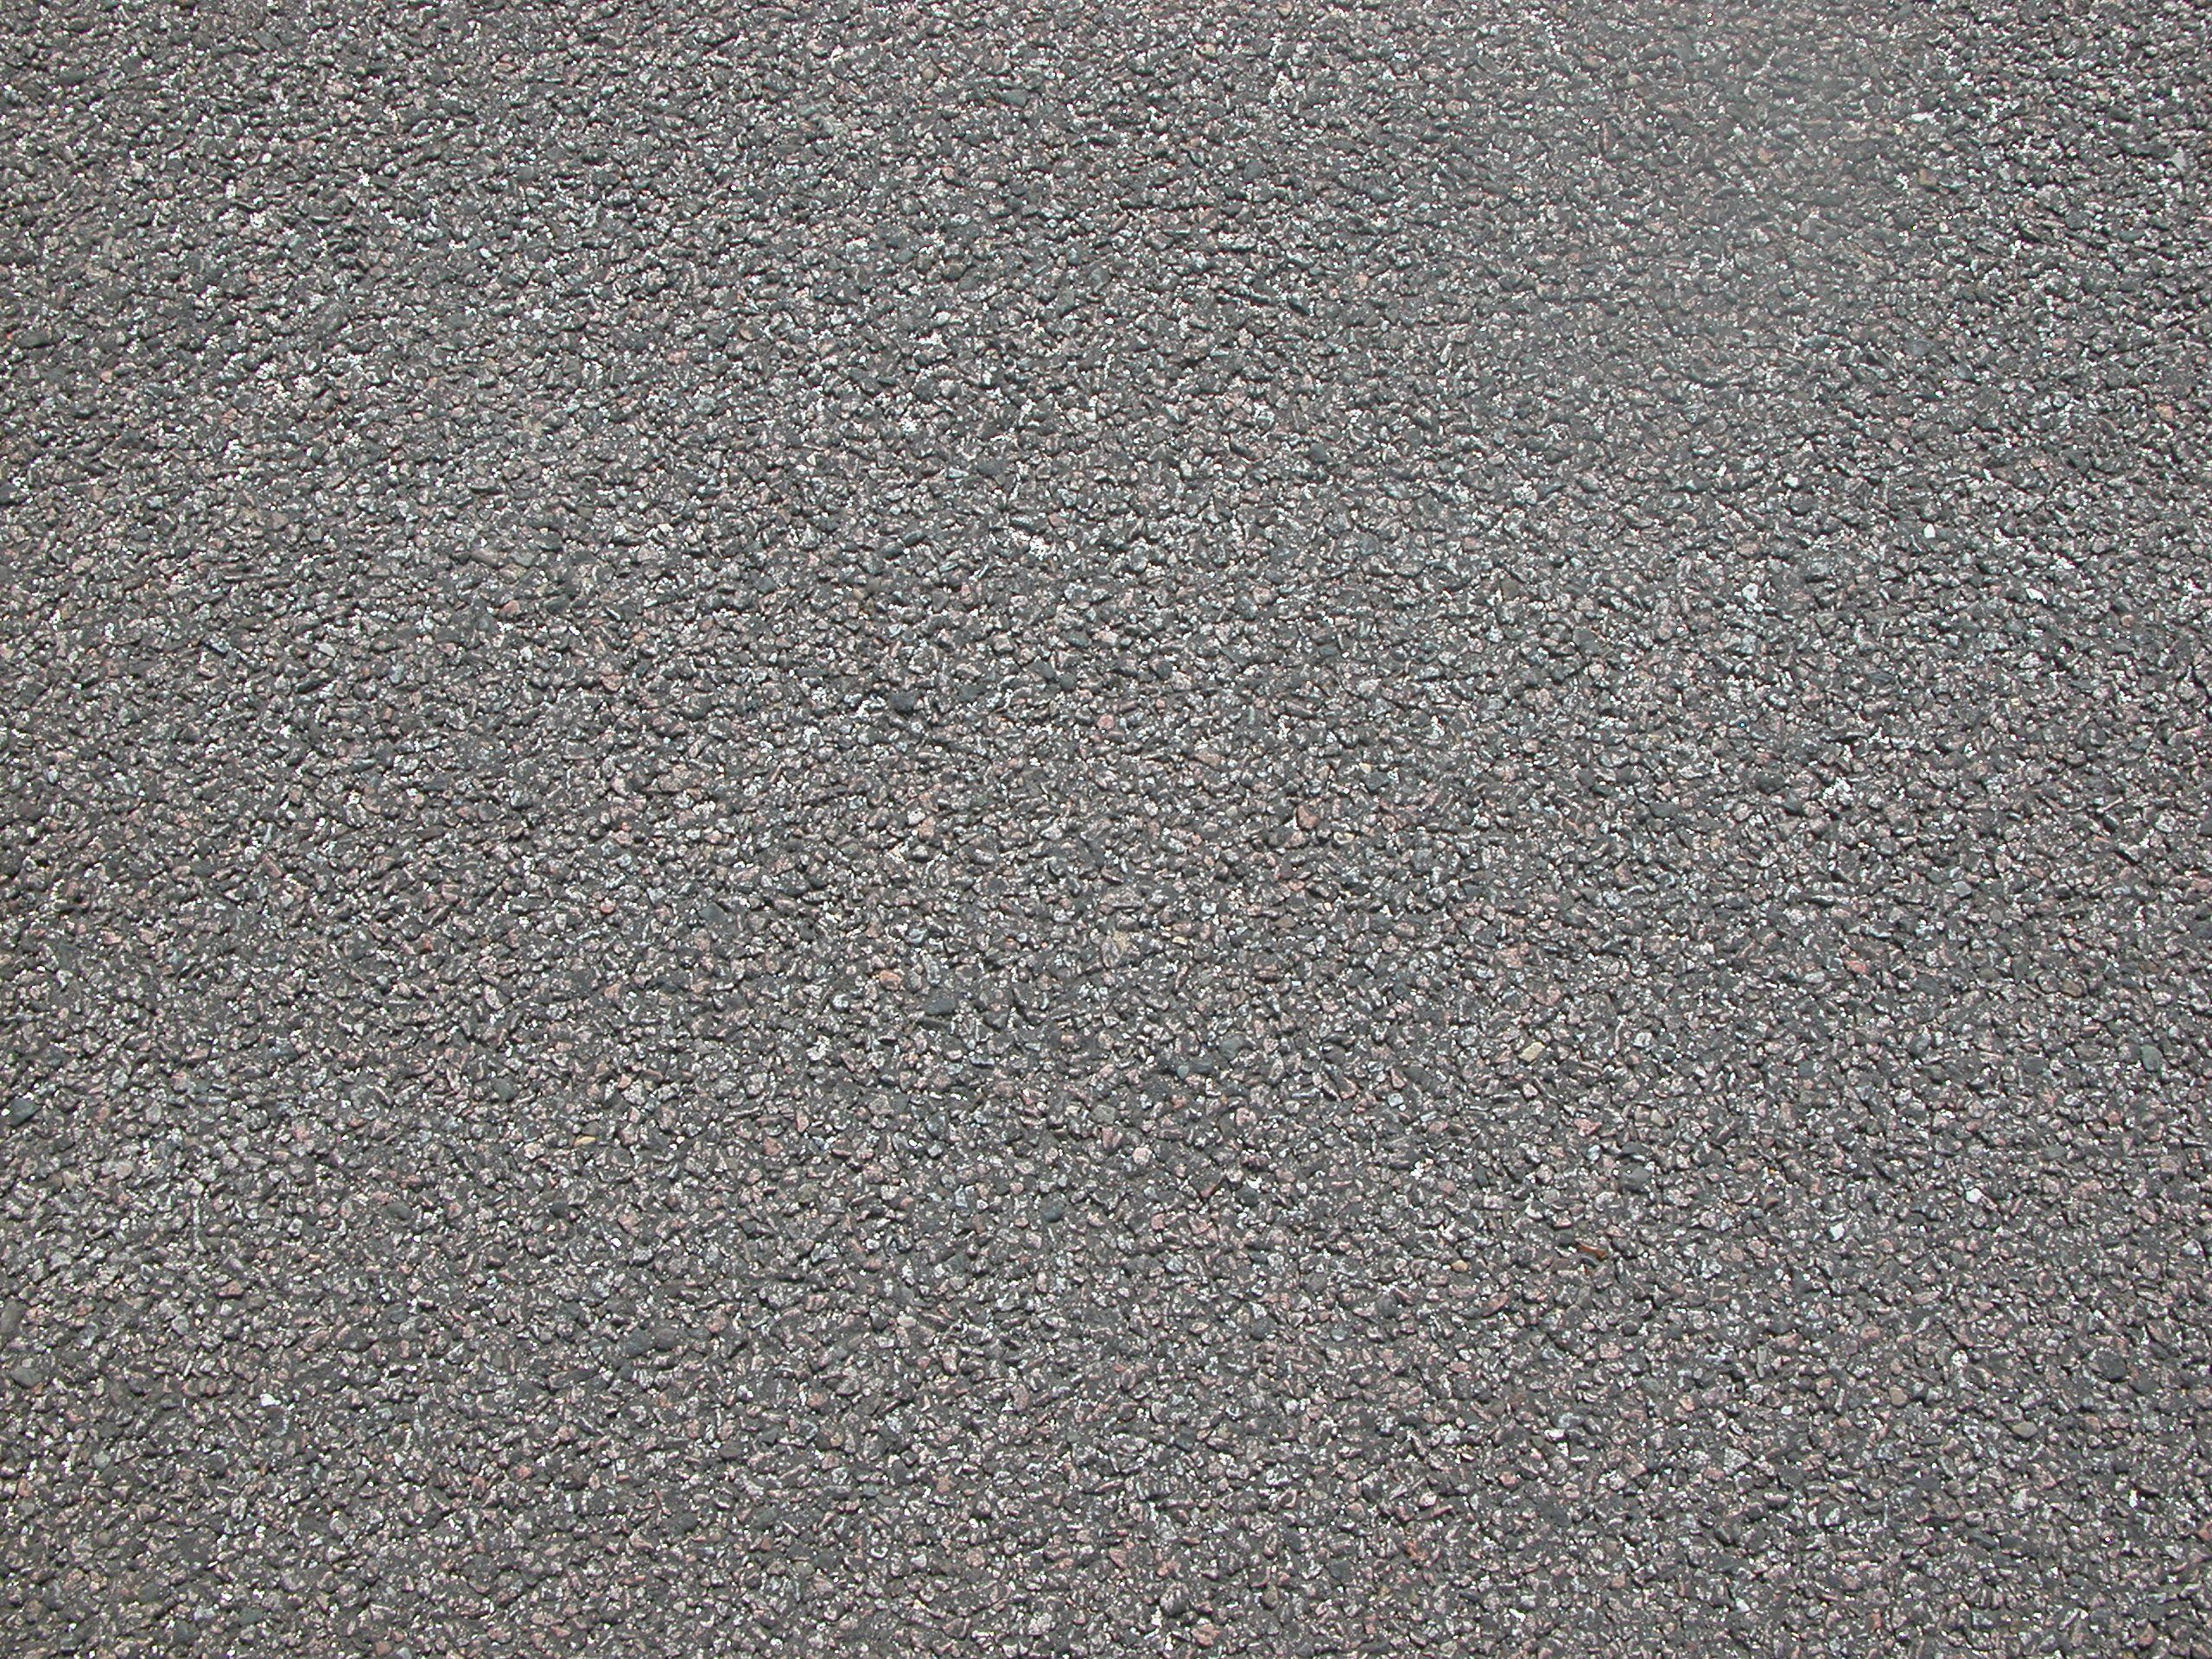 Asphalt Road Tarmac Black